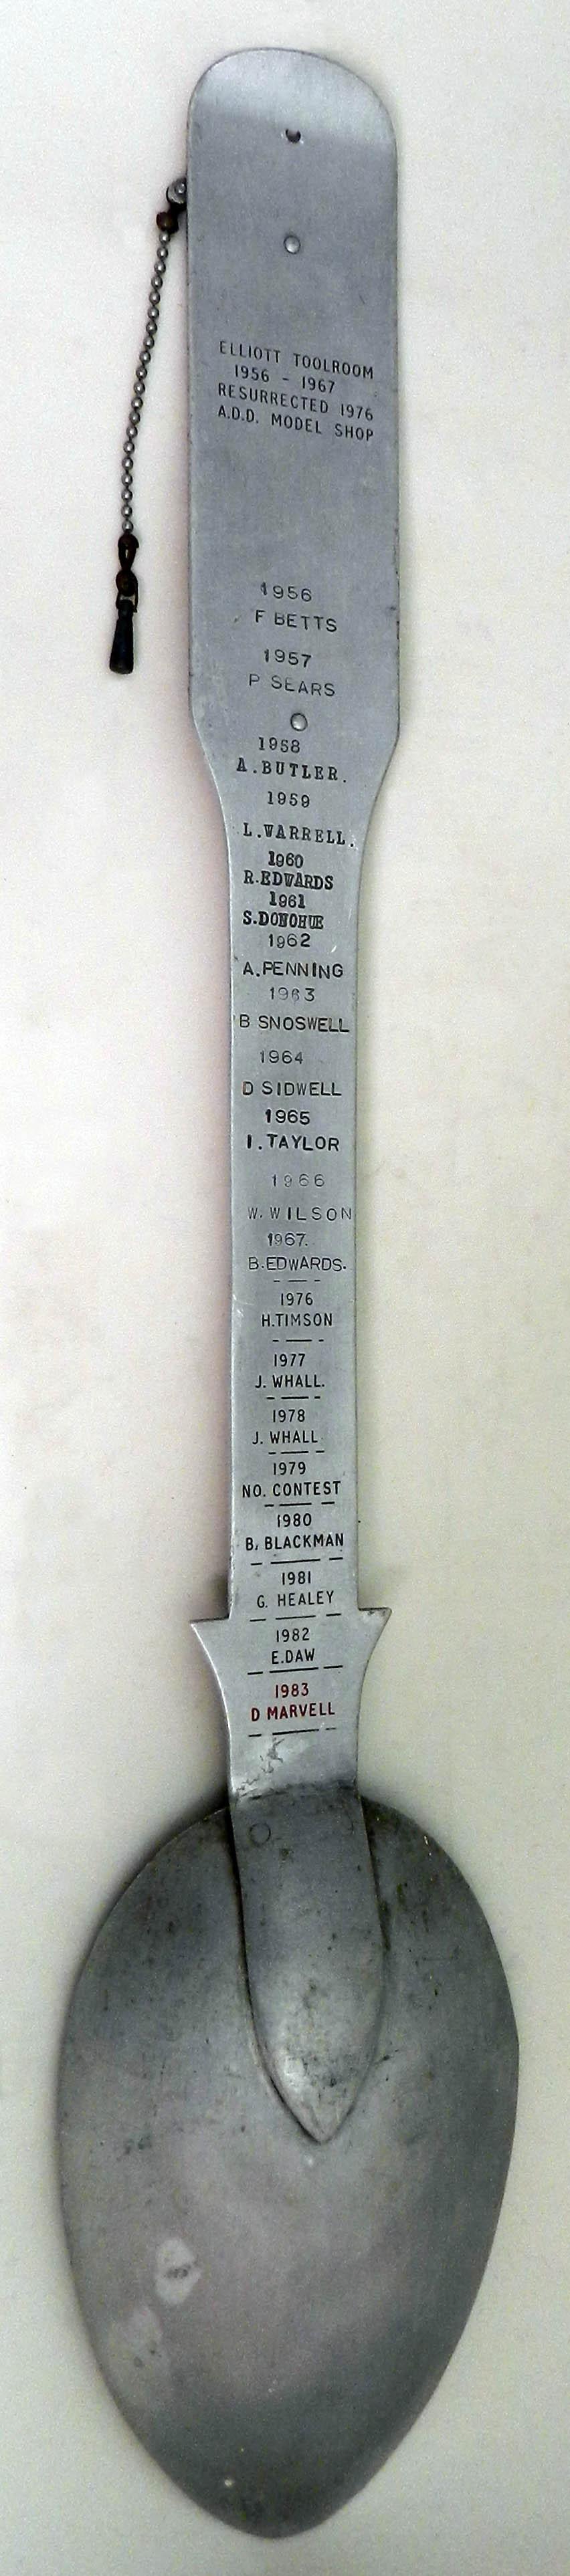 Elliott Toolroom/ADD Model Shop Award.  1956-1983.   (tongue in cheek)